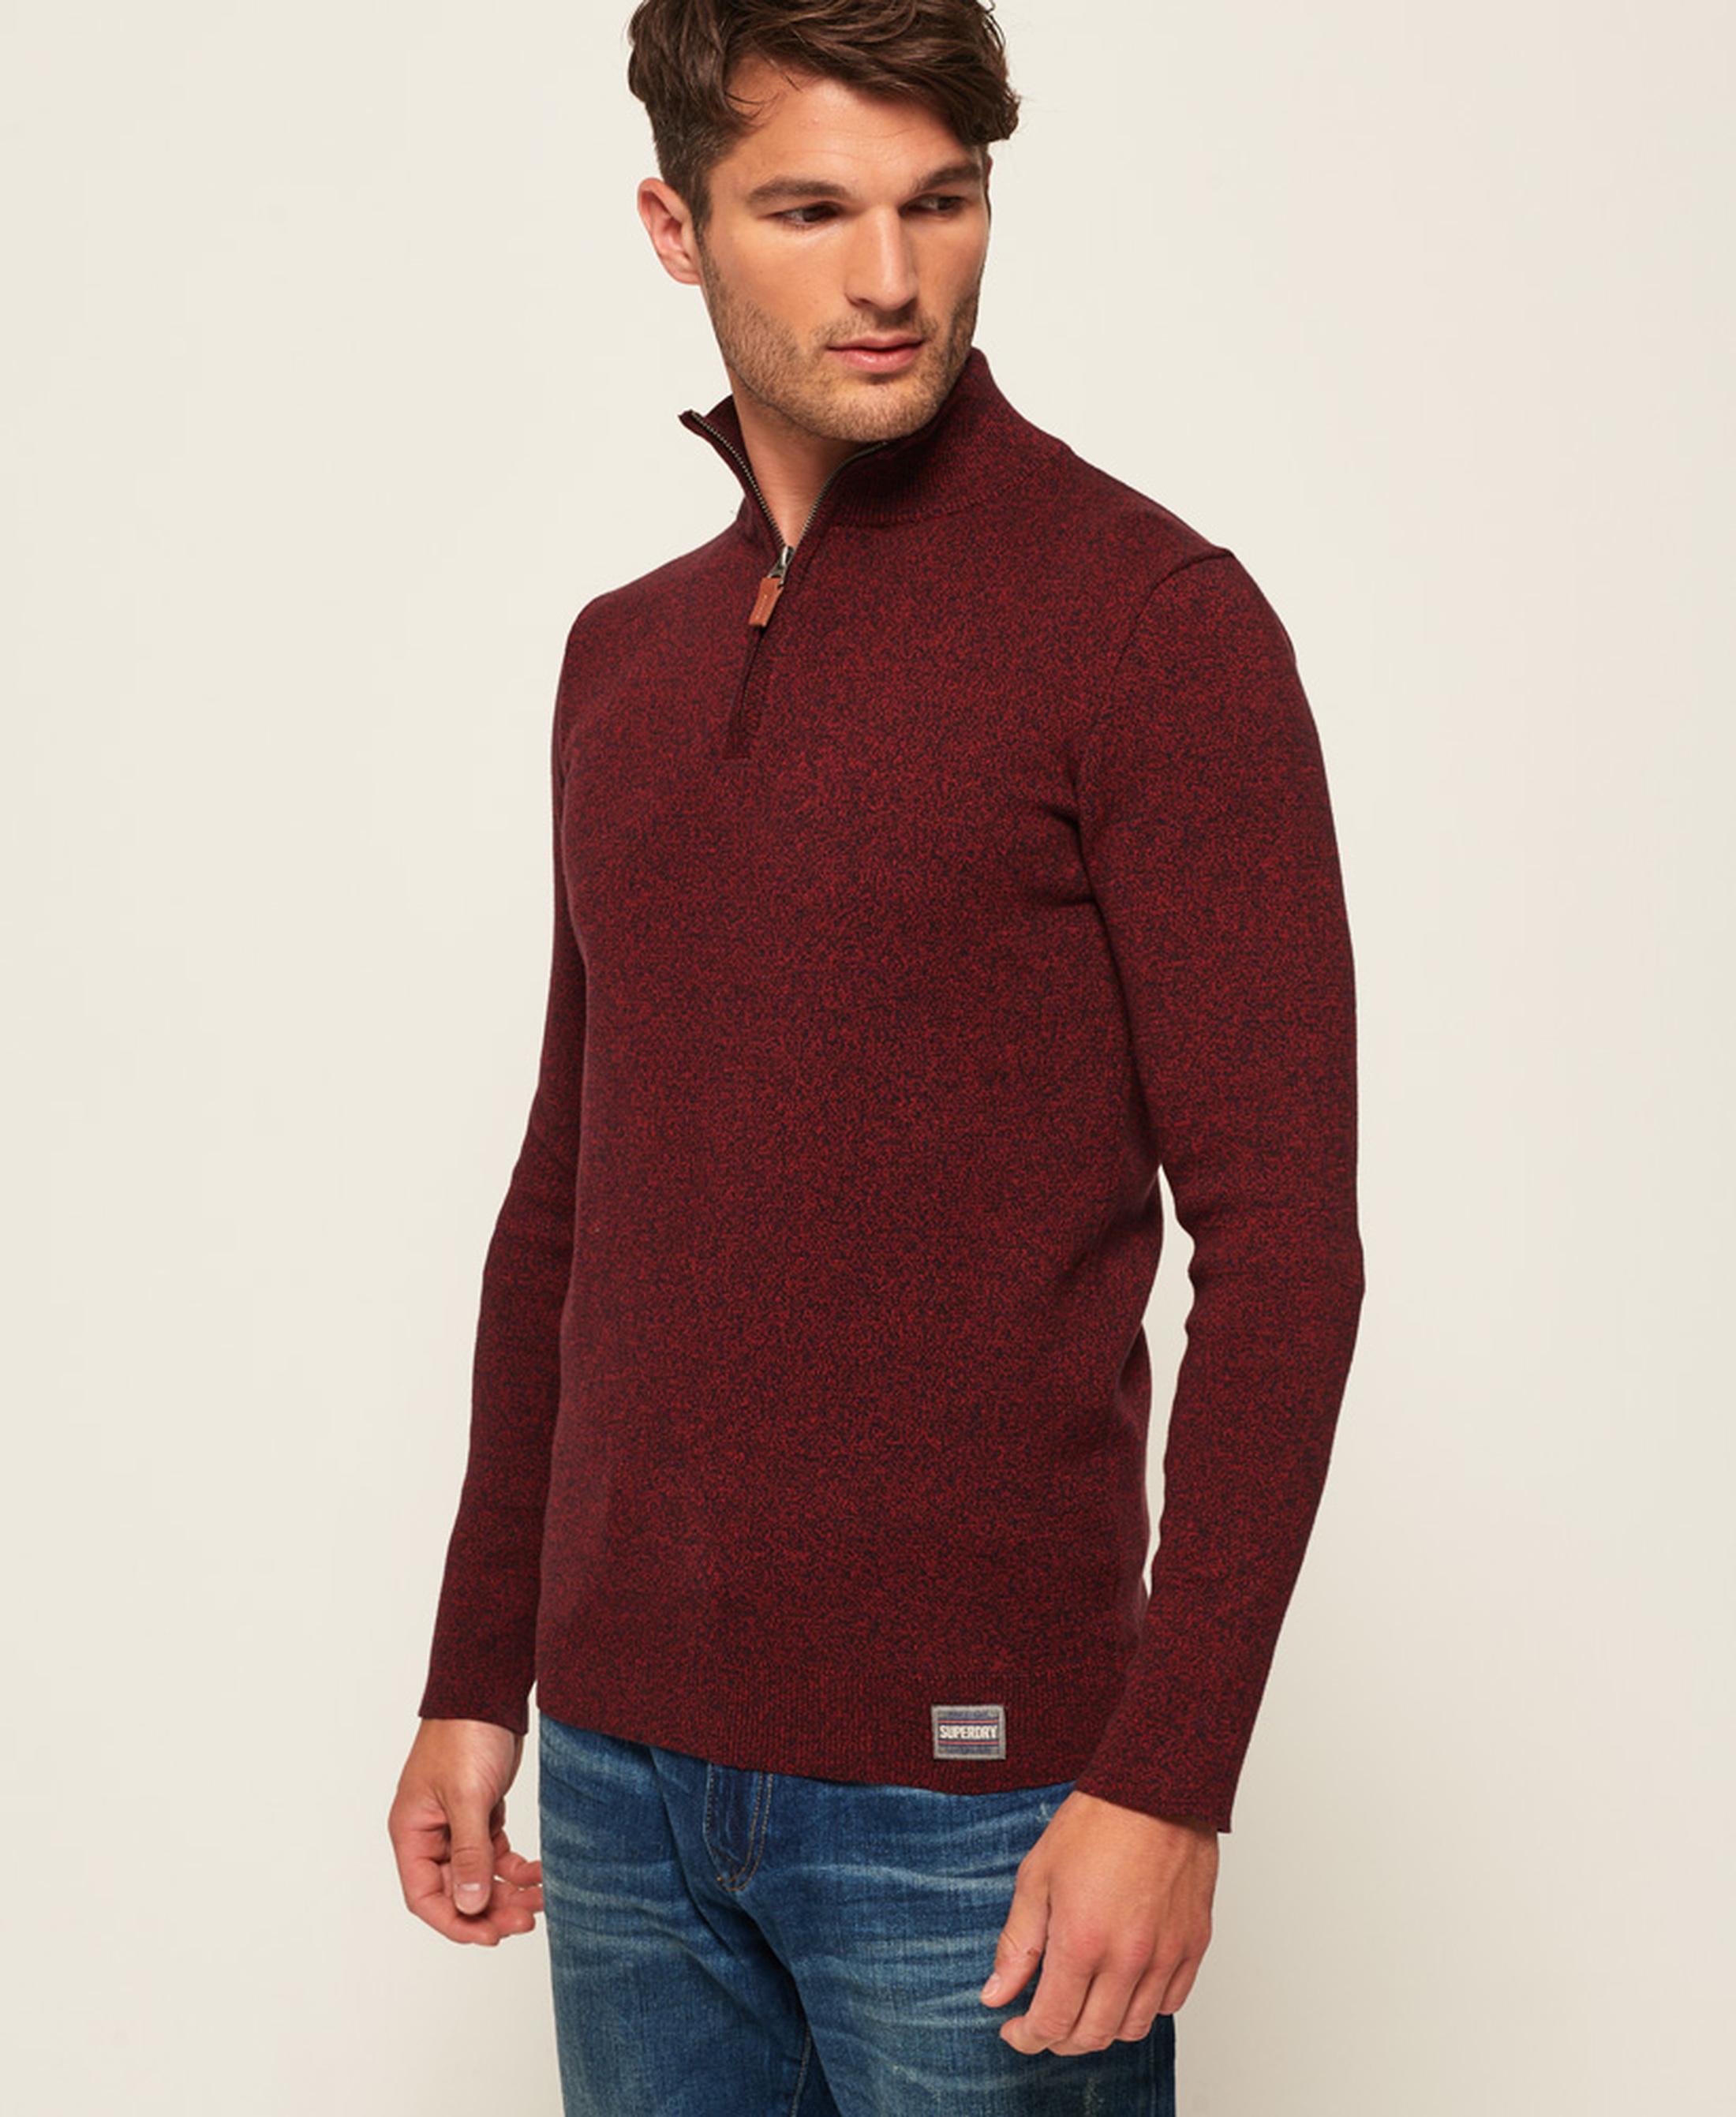 Superdry Sweater Melange Rood Rits foto 1